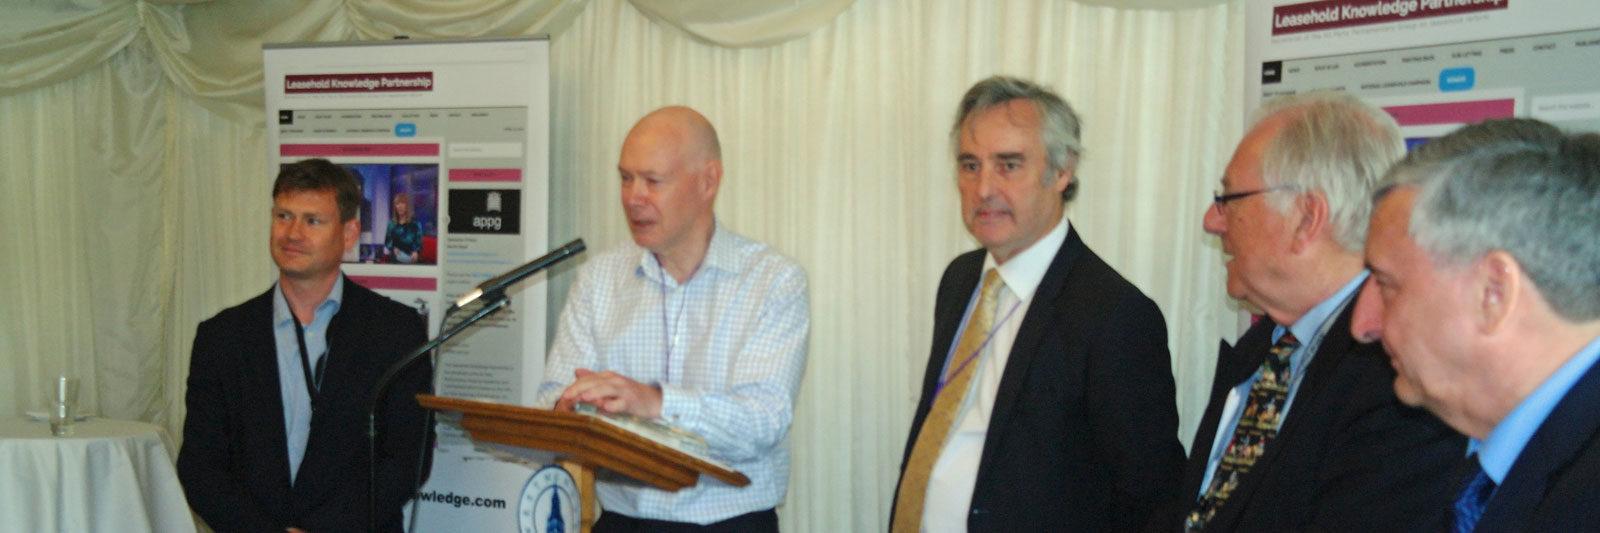 Leasehold Knowledge Partnership Parliamentary award